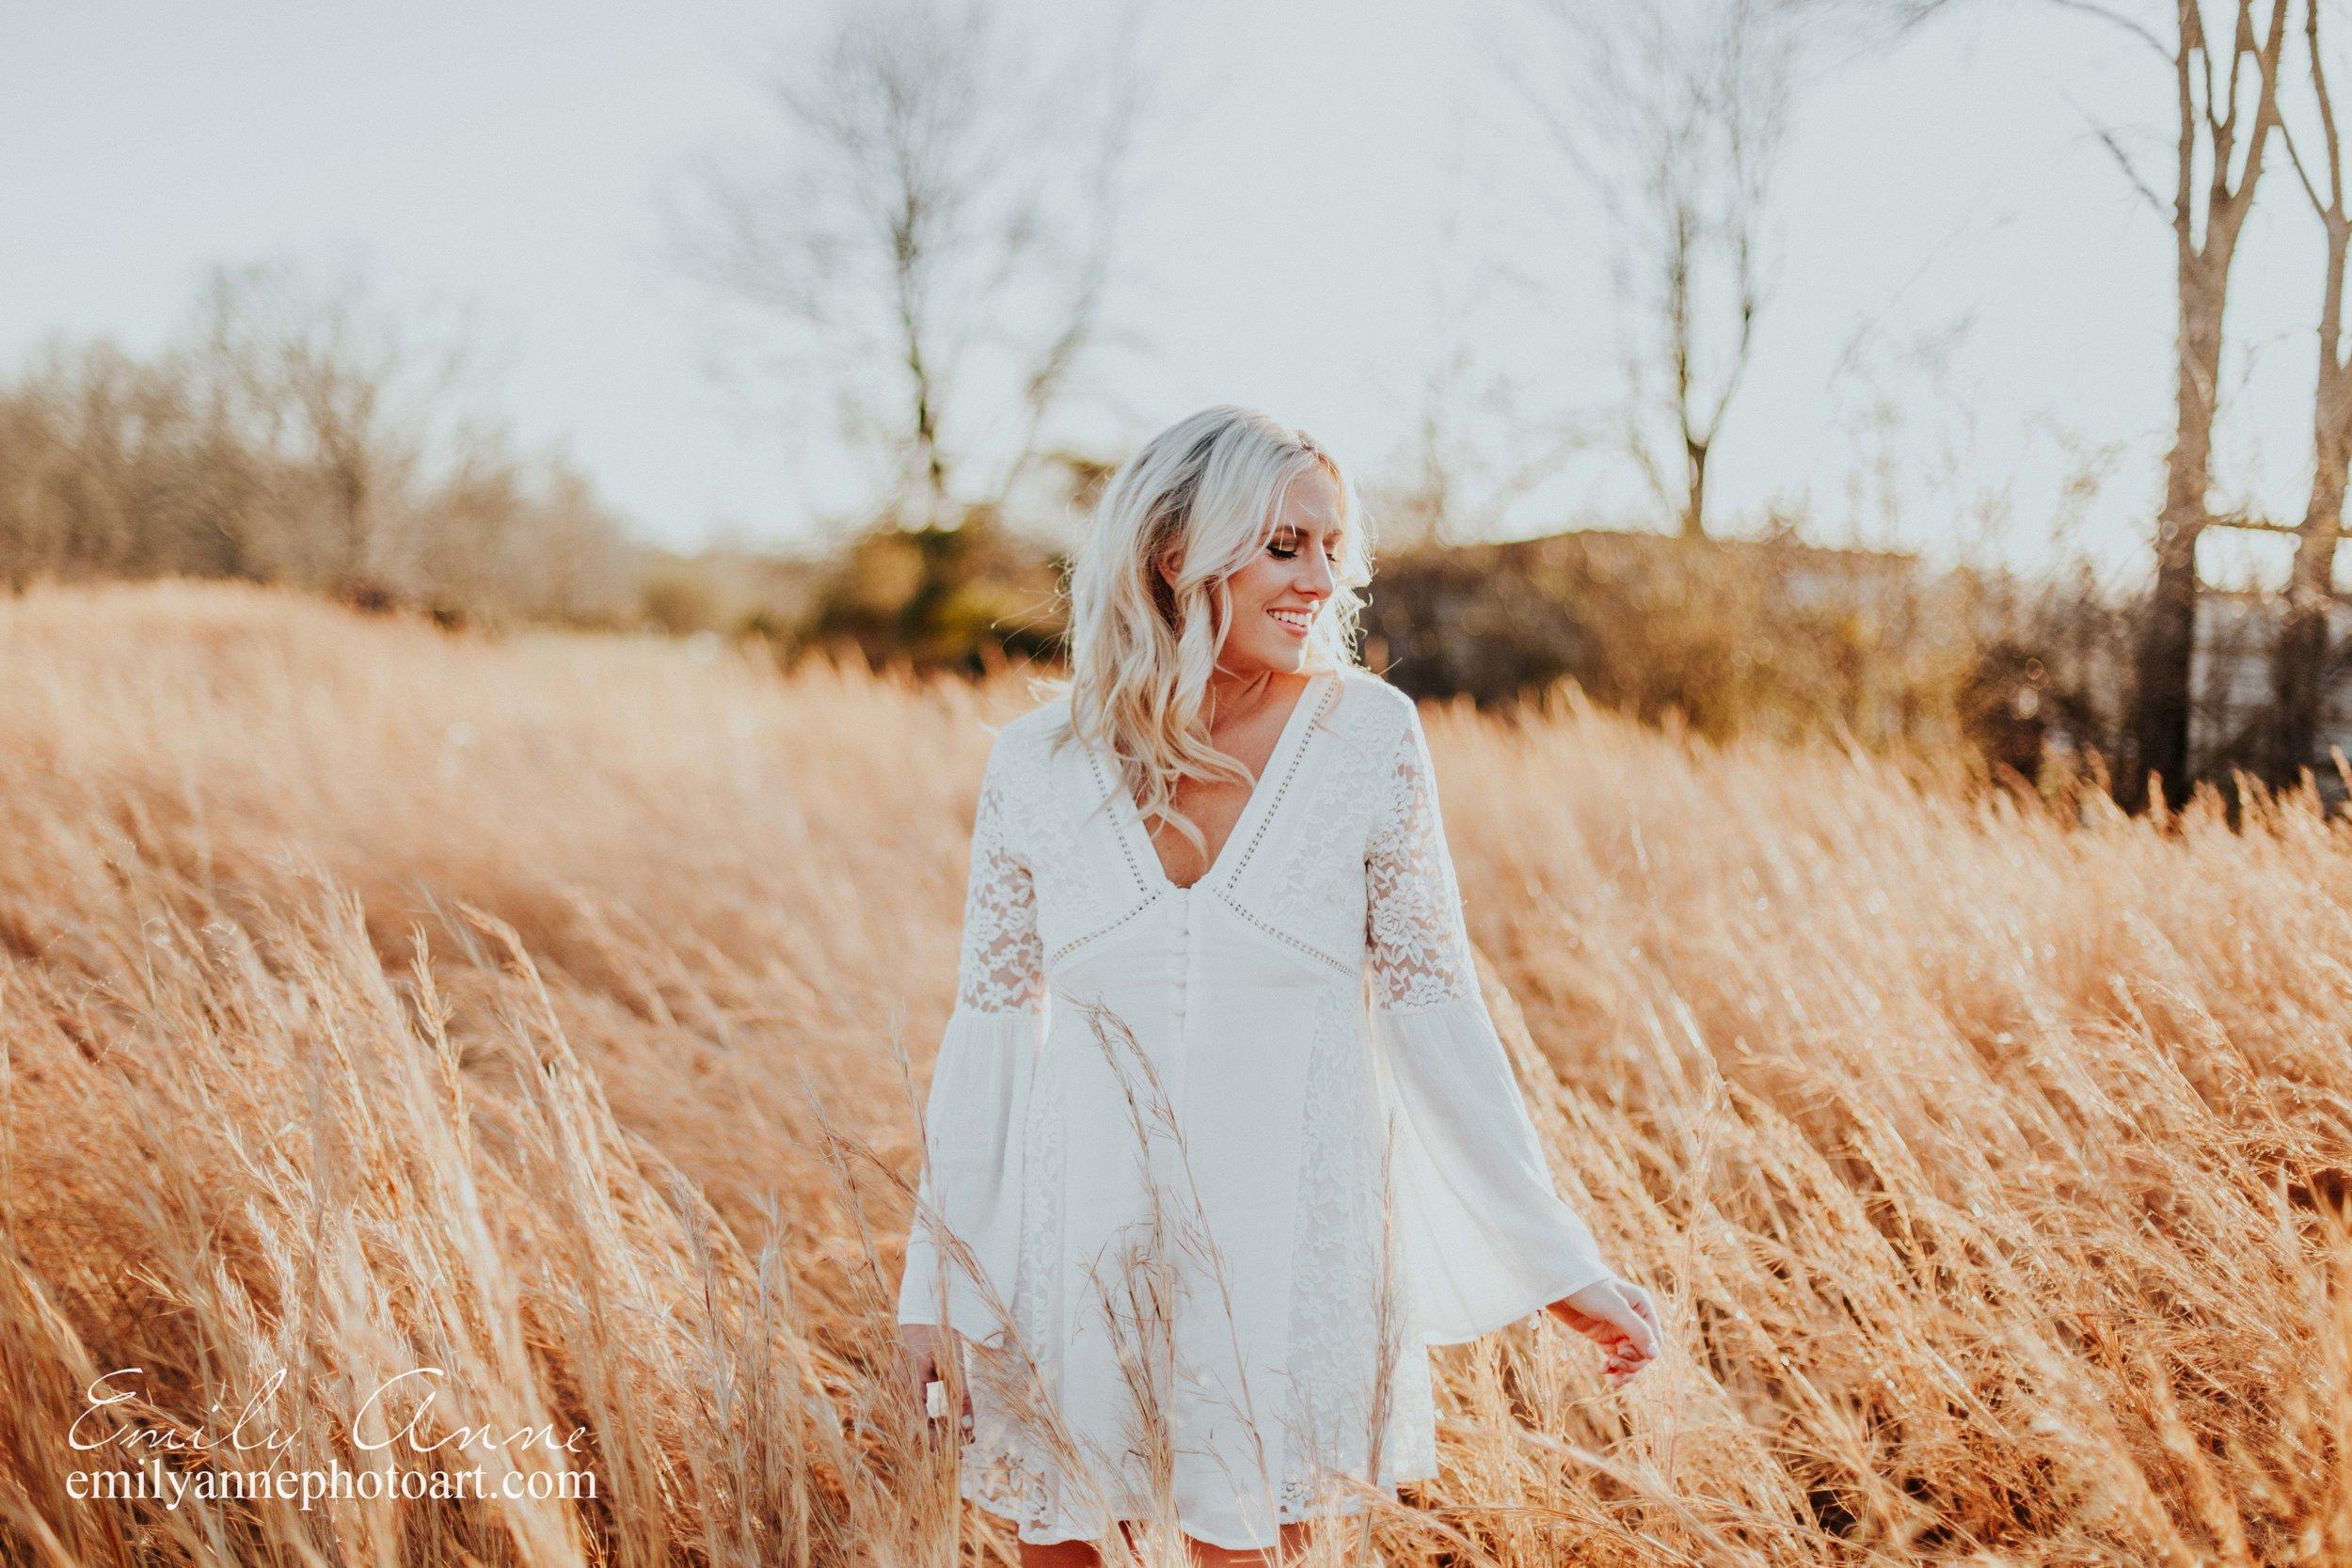 best senior portrait photographer nashville/brentwood/franklin tn